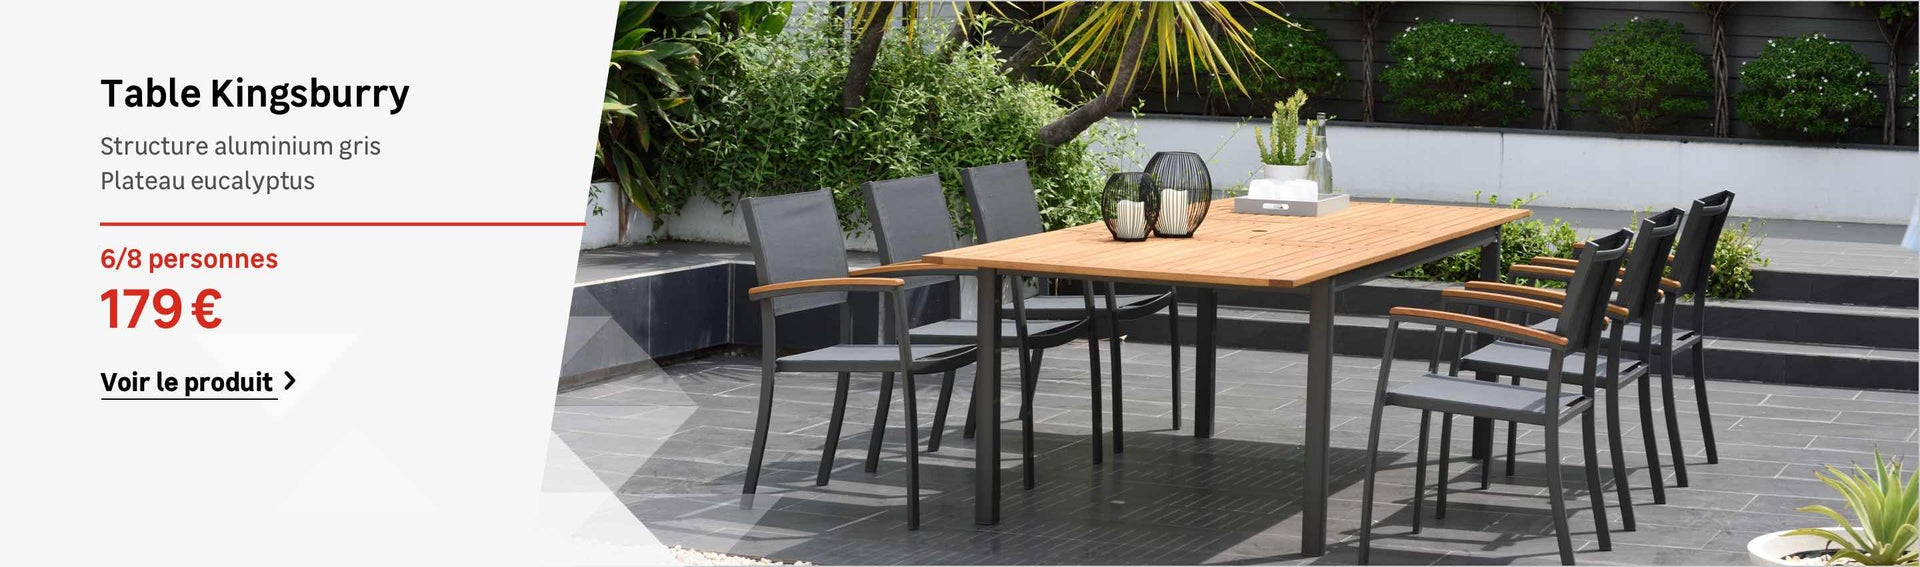 Table Et Chaise De Jardin Aluminium Inspirant Table Et ... encequiconcerne Table Et Chaise De Jardin En Solde